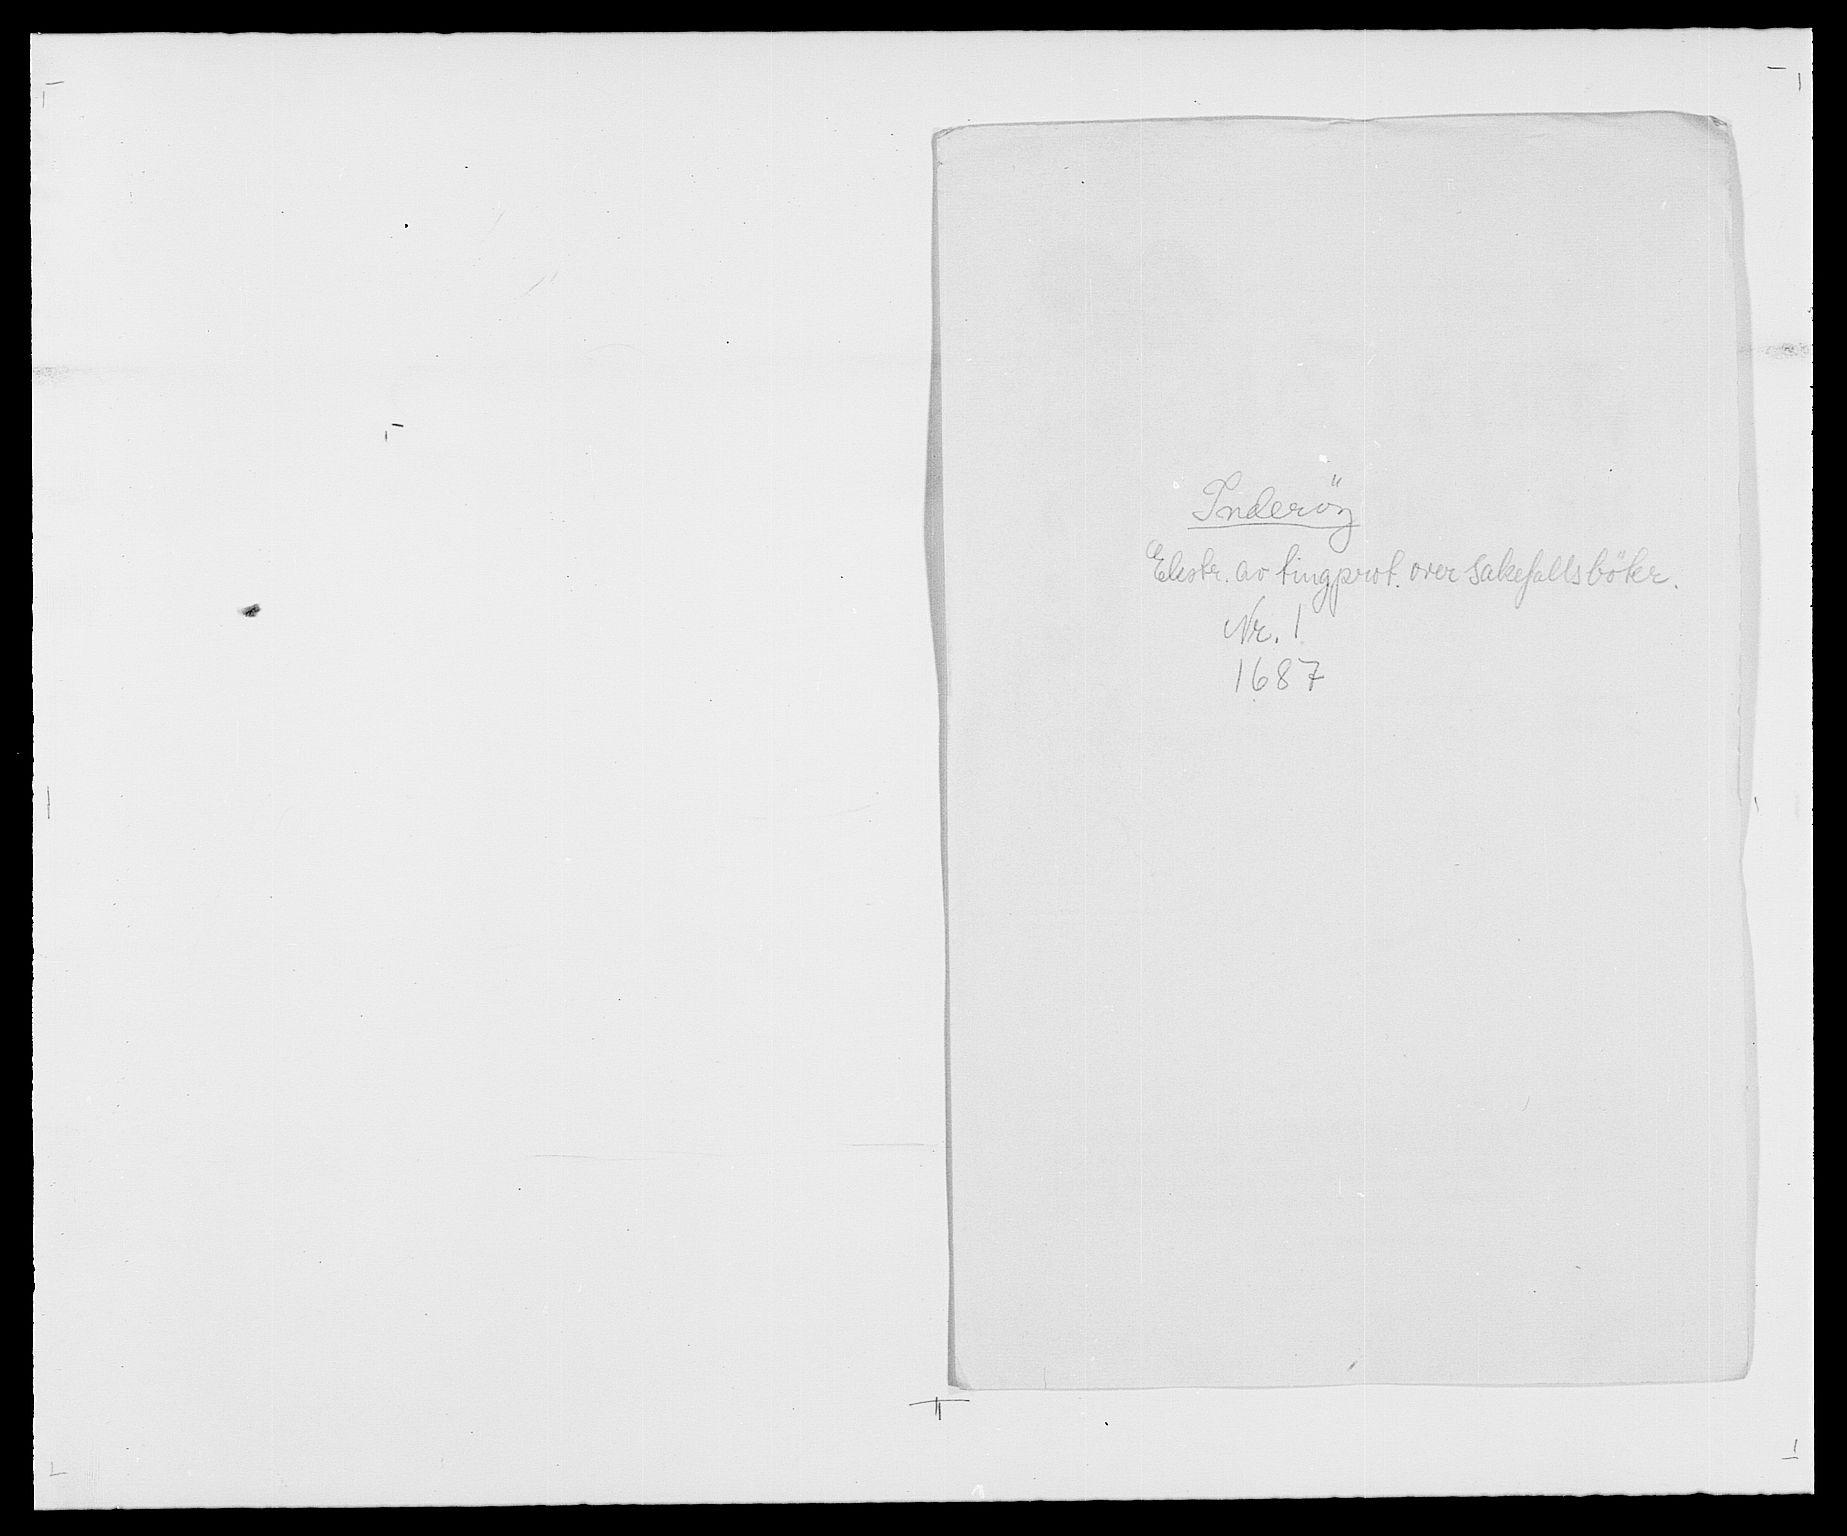 RA, Rentekammeret inntil 1814, Reviderte regnskaper, Fogderegnskap, R63/L4306: Fogderegnskap Inderøy, 1687-1689, s. 192